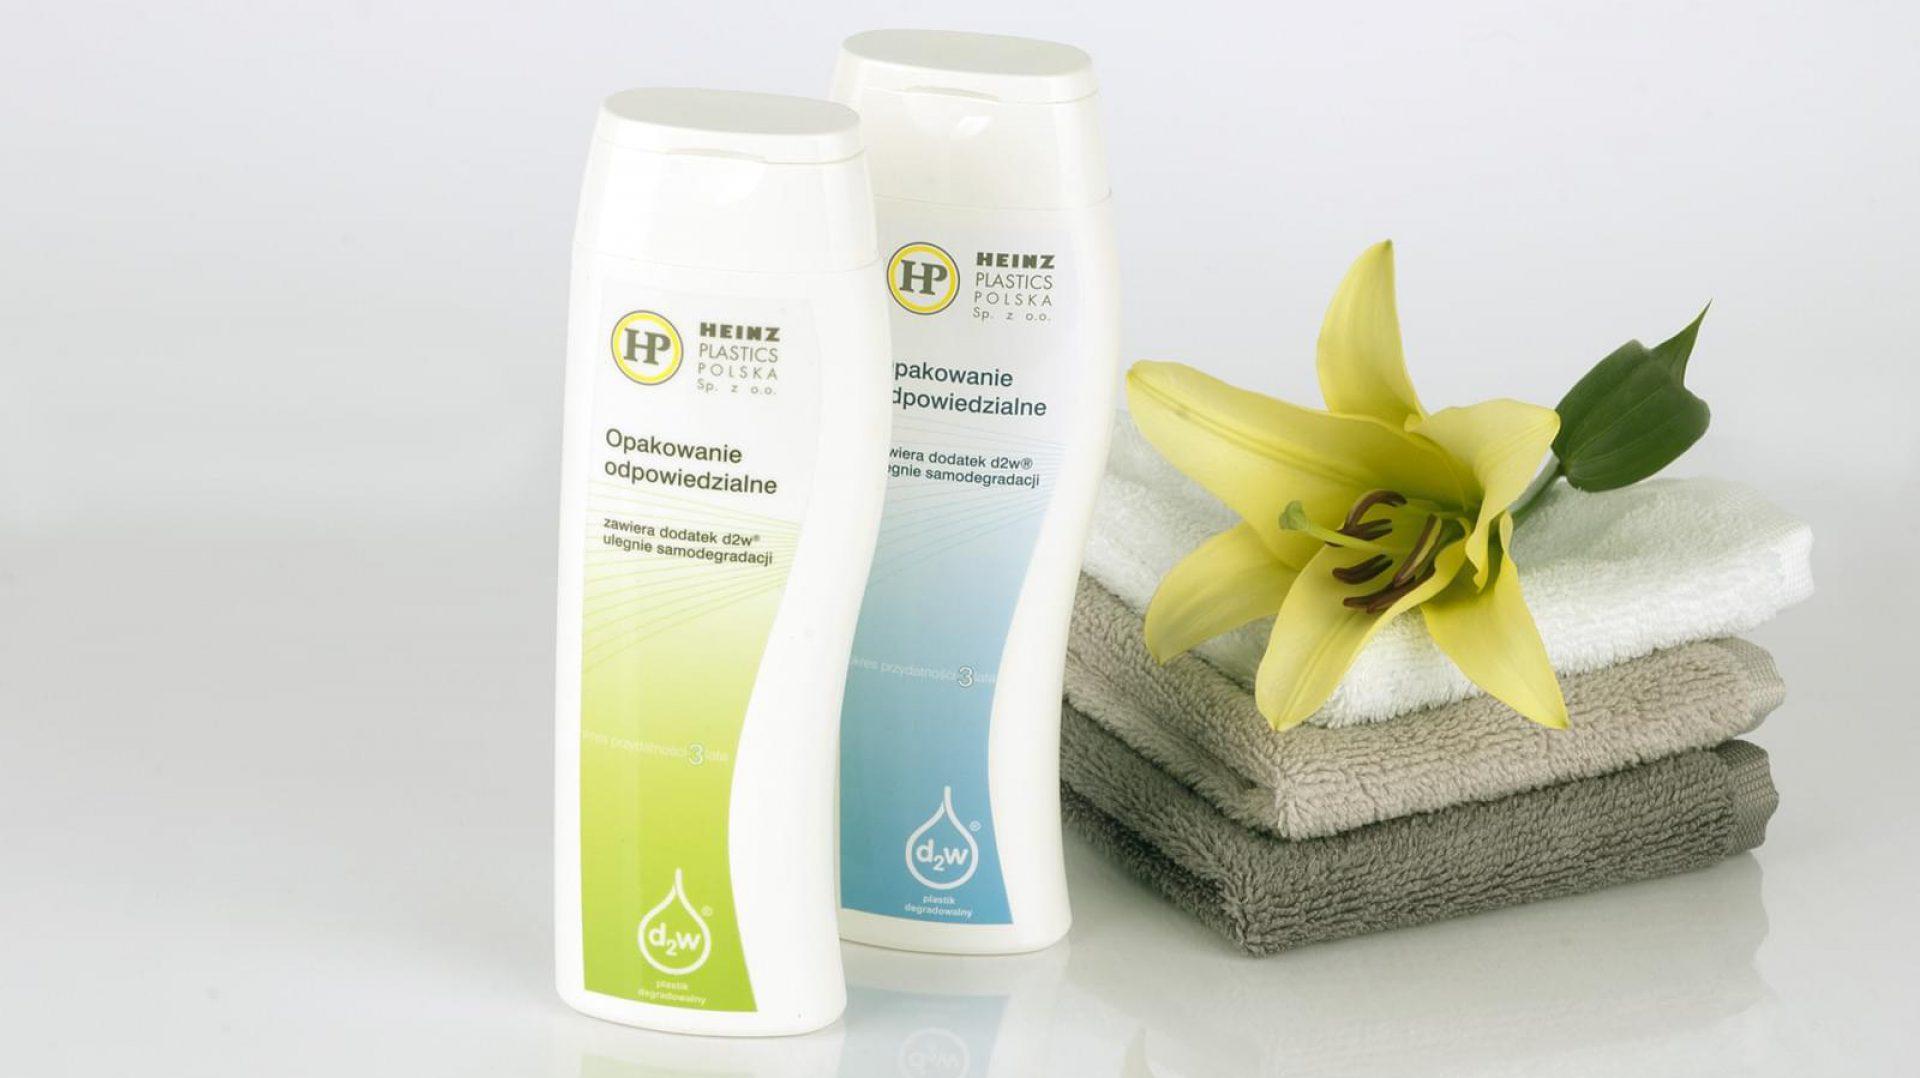 Ecoplastic